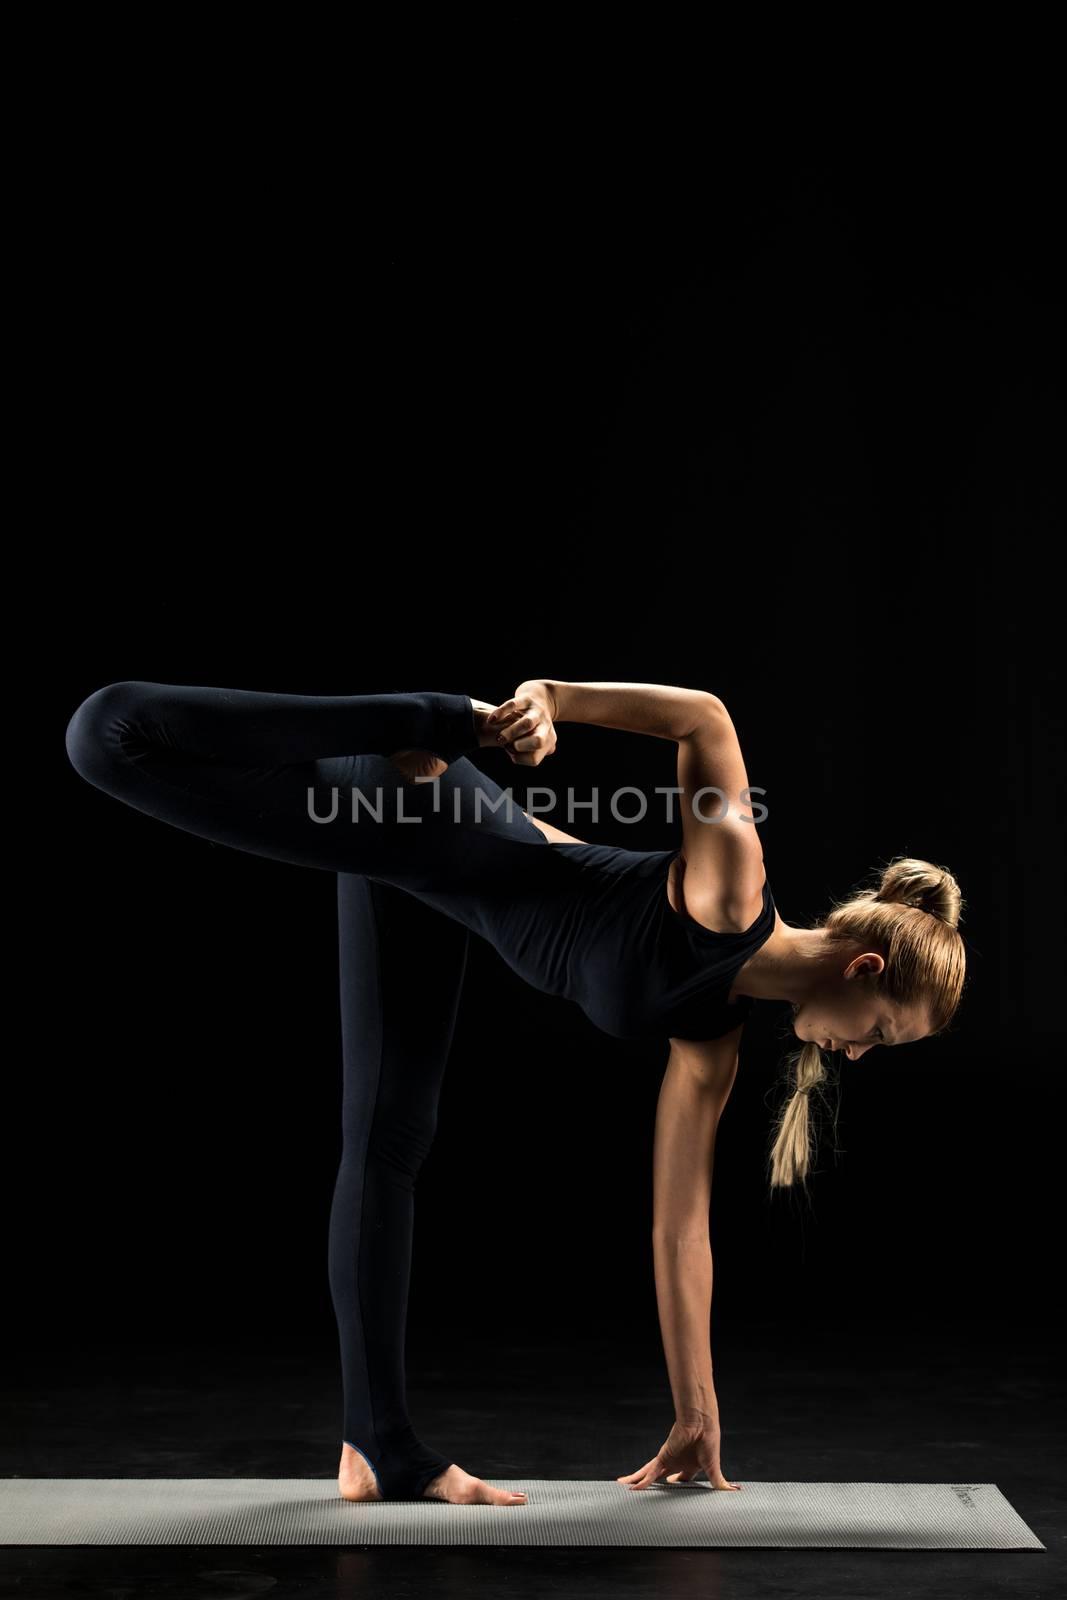 Woman practicing yoga on yoga mat